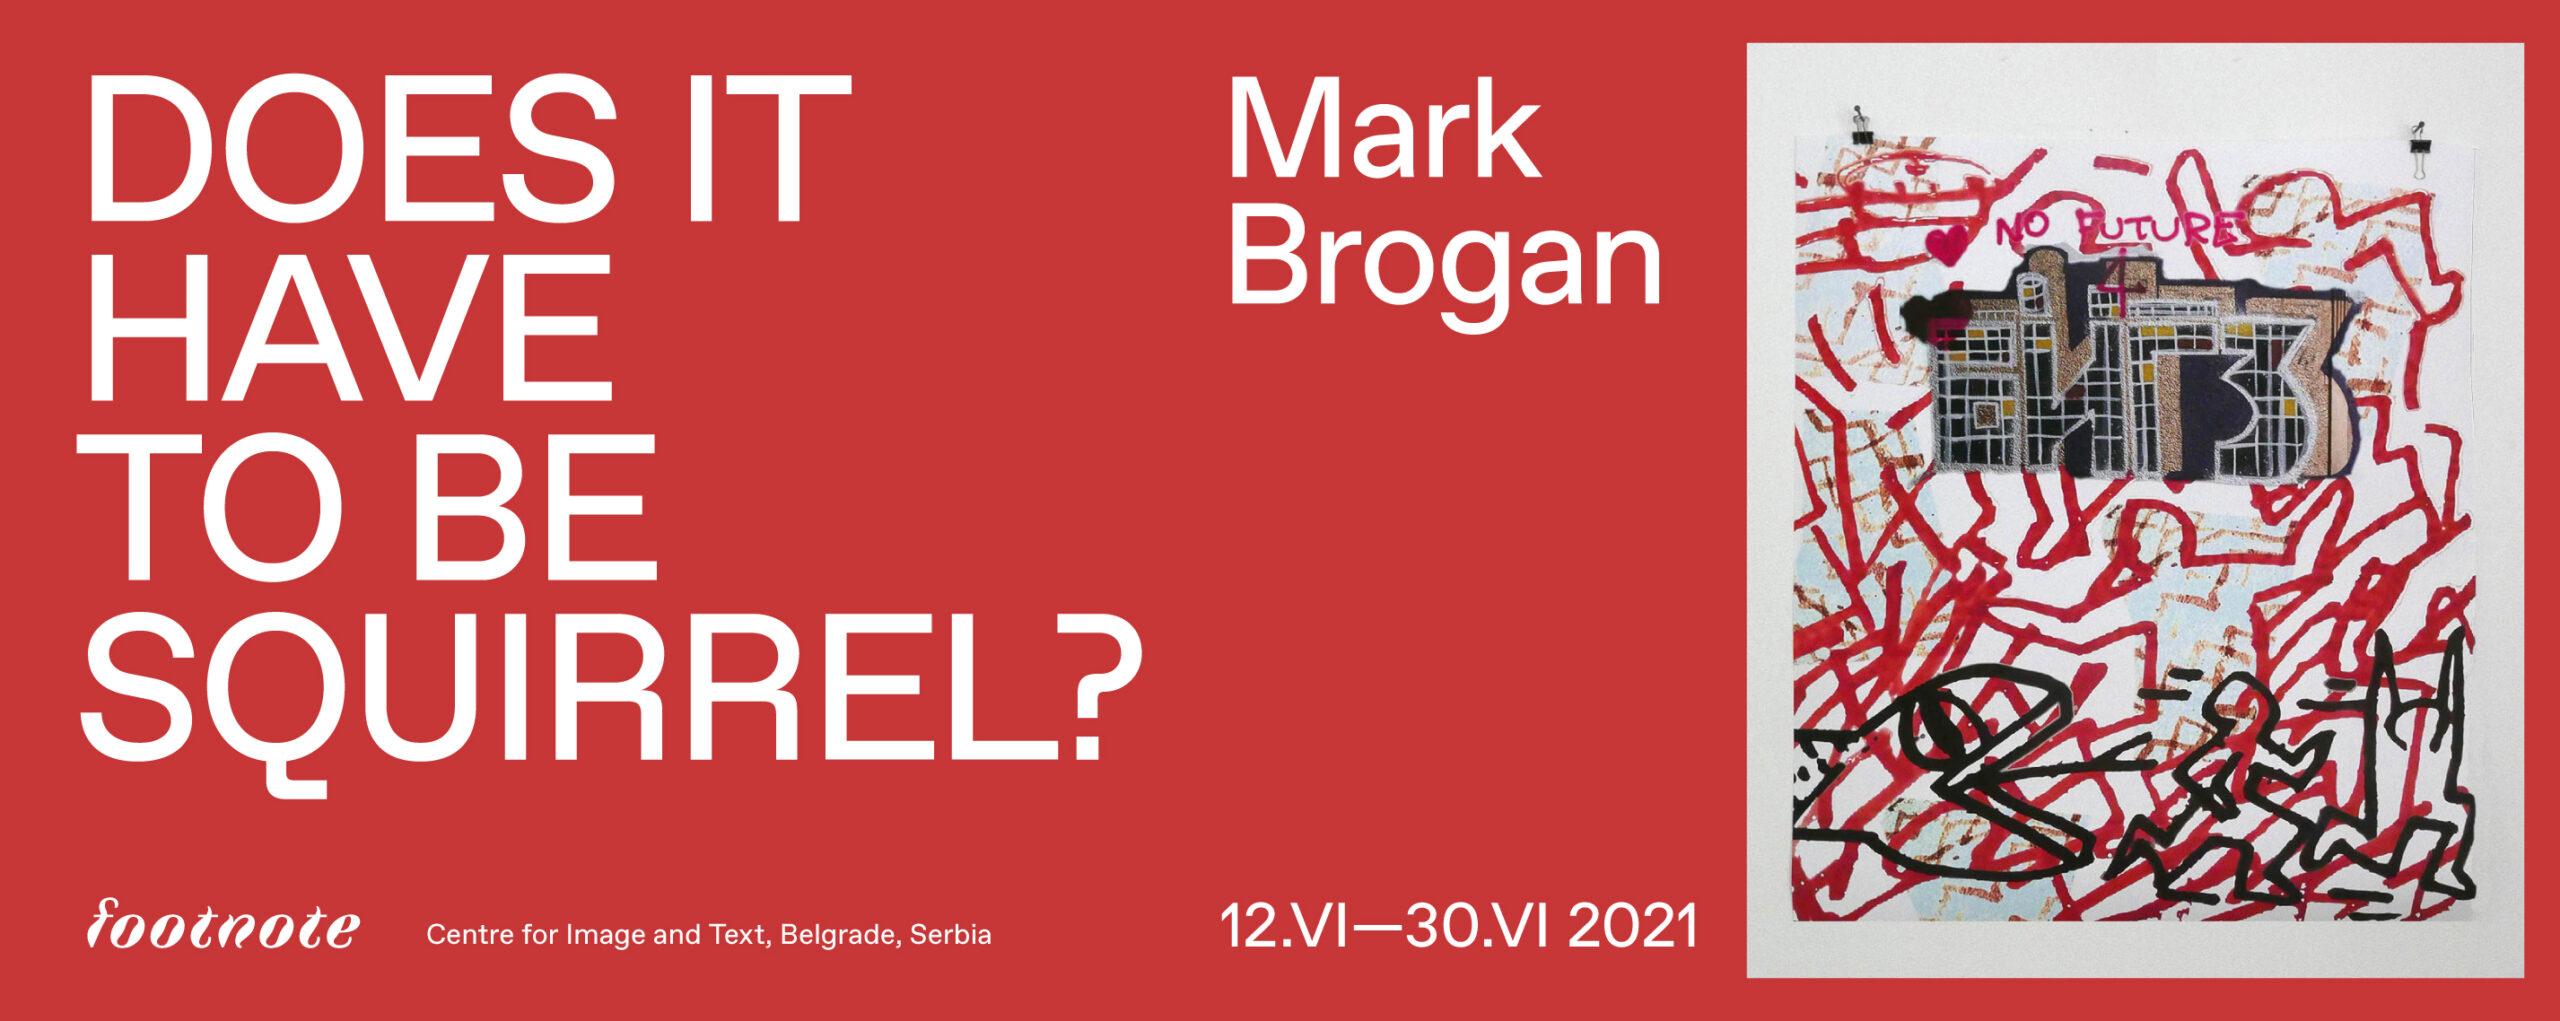 mark_brogan_web-banner